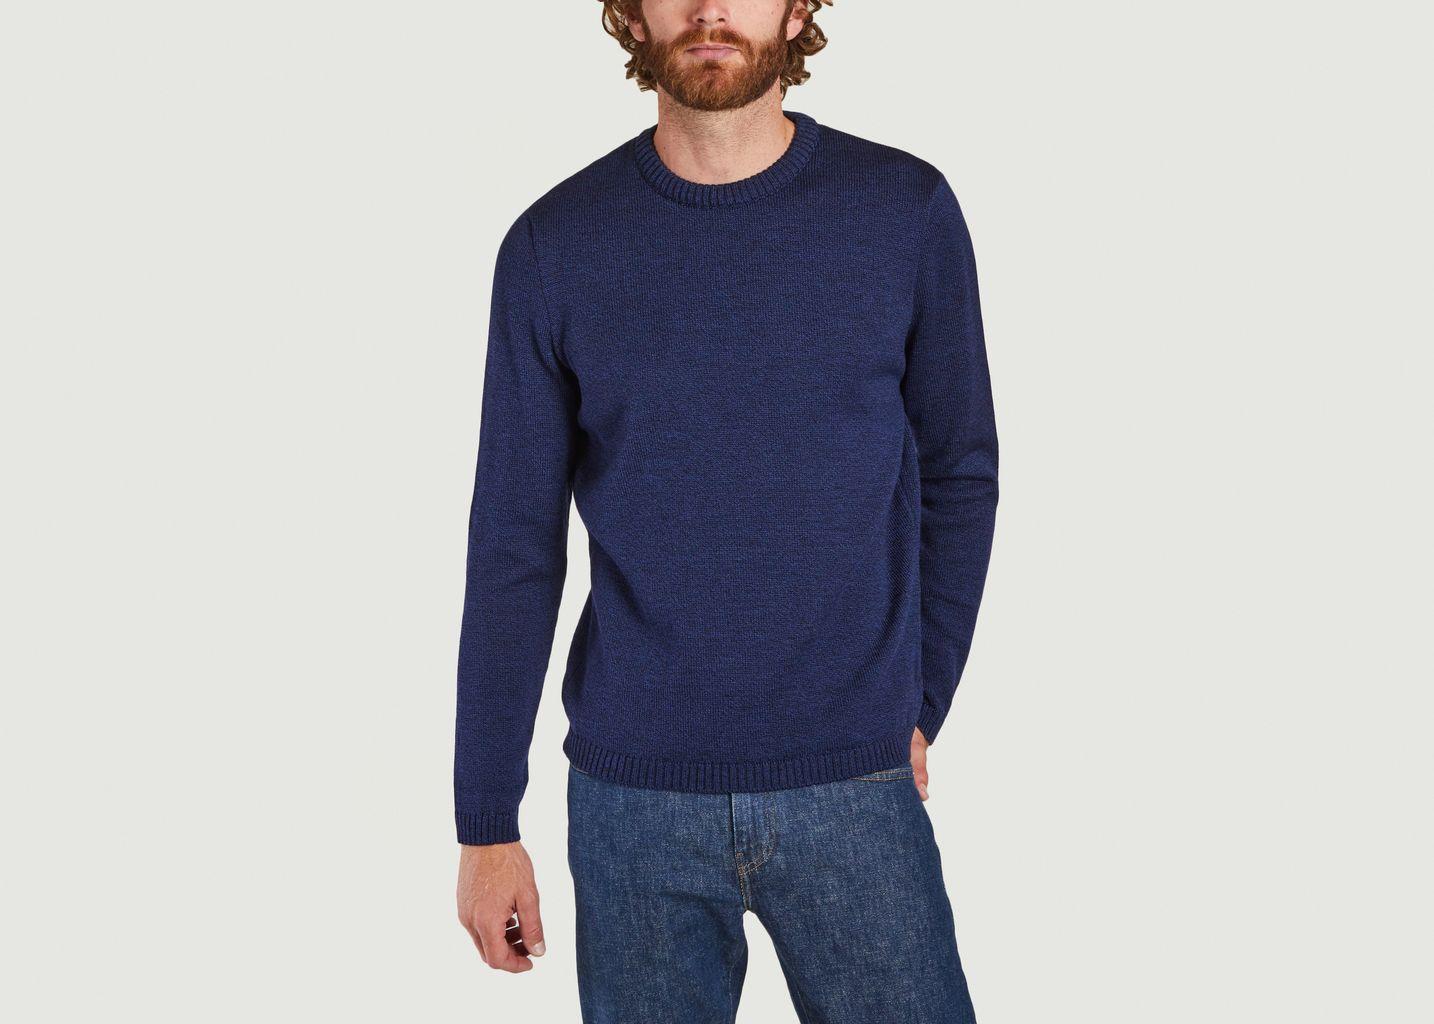 Pull pêcheur en laine mérinos - JagVi